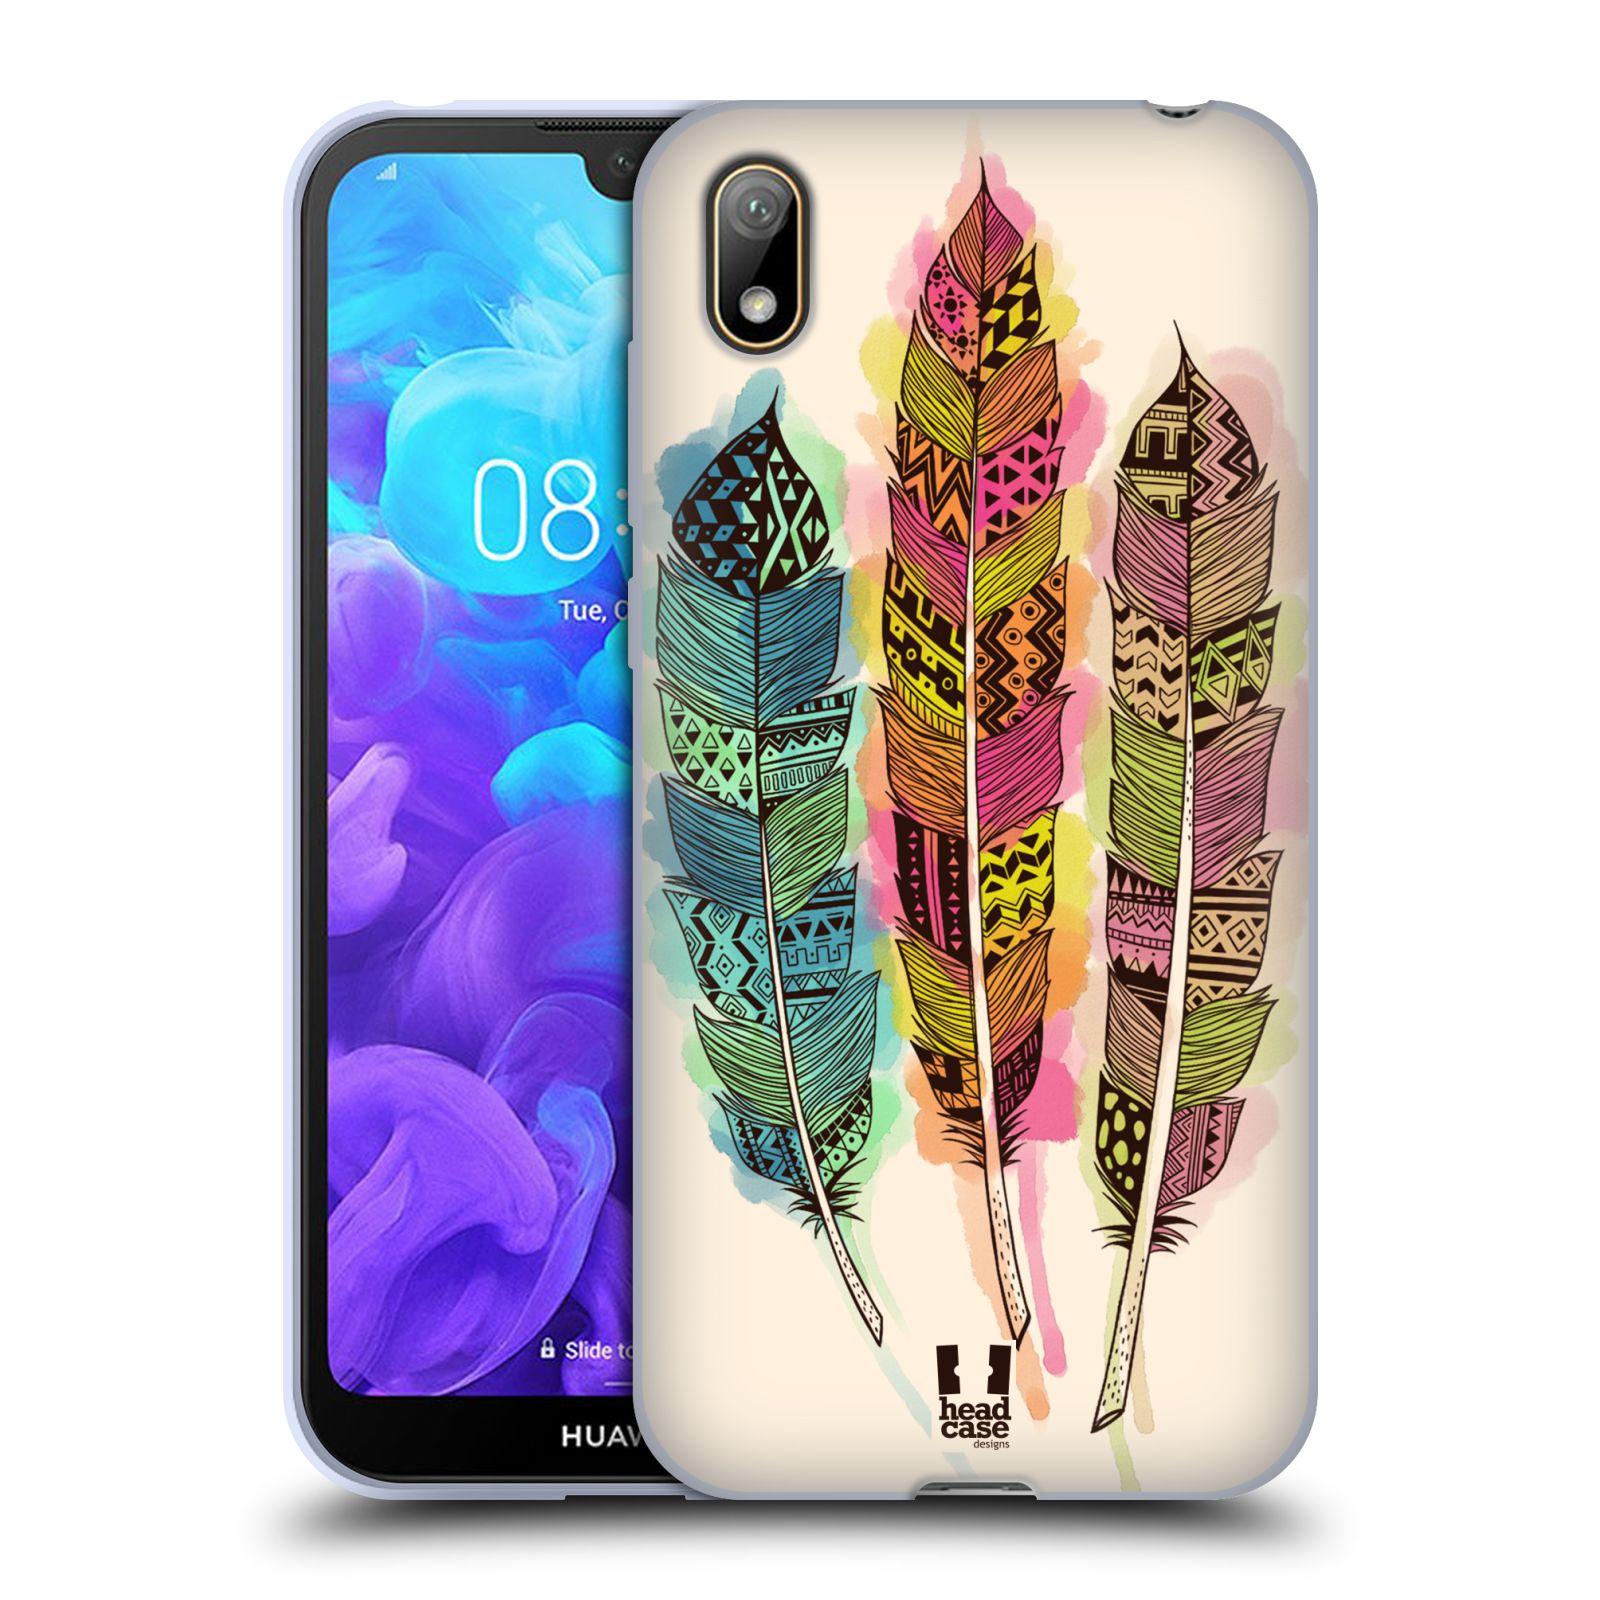 Silikonové pouzdro na mobil Huawei Y5 (2019) - Head Case - AZTEC PÍRKA SPLASH